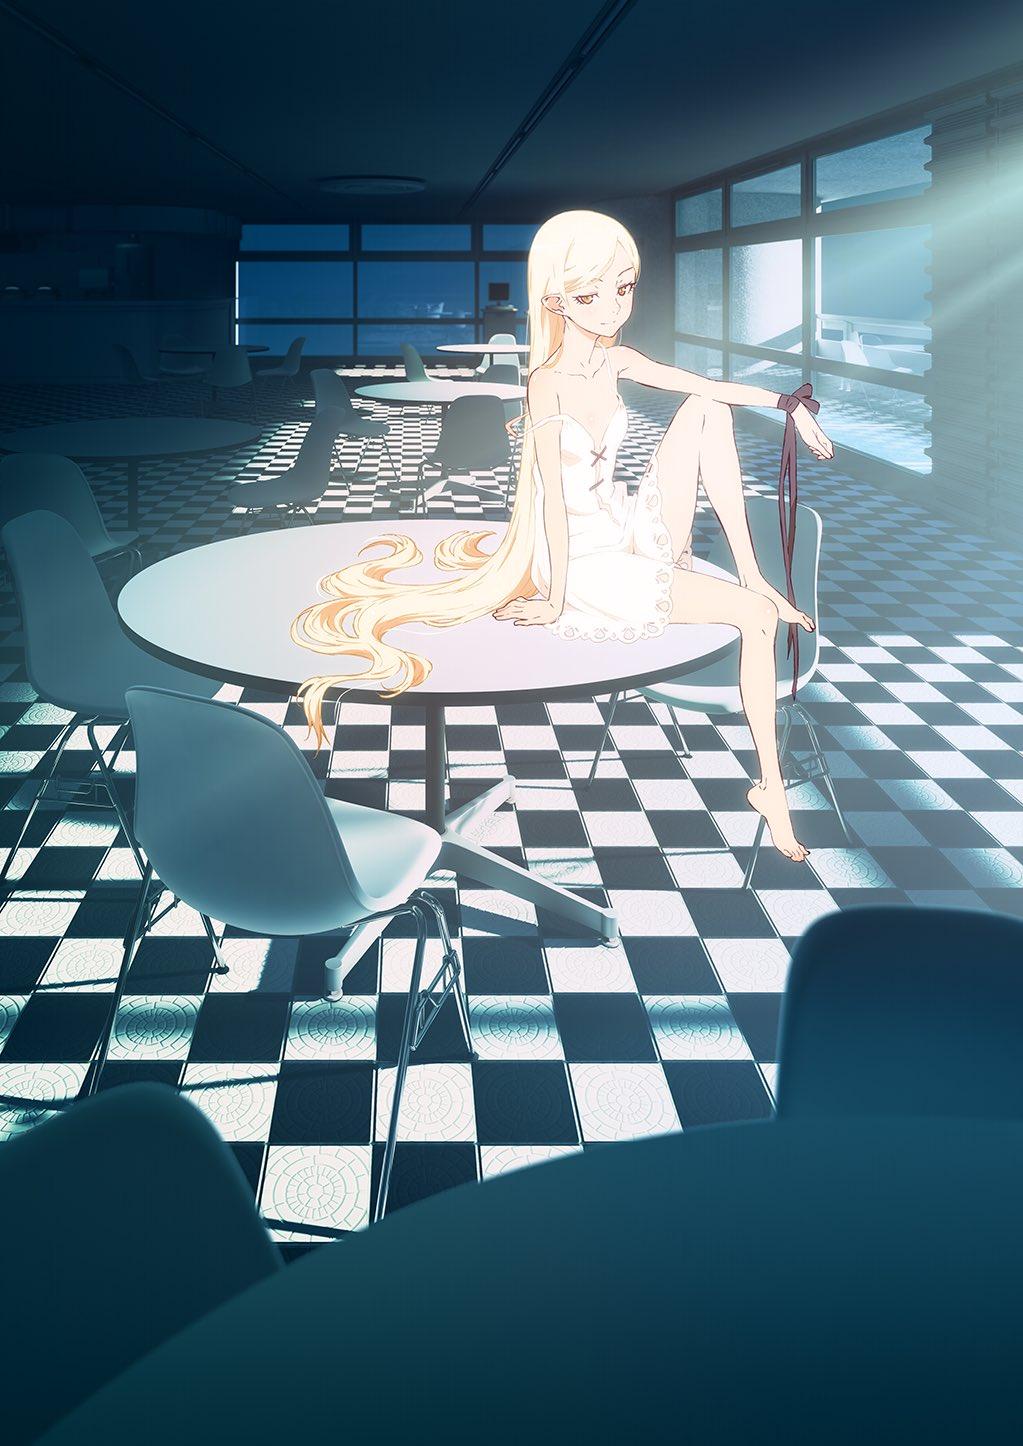 Kizumonogatari II: Nekketsu-hen anime trailer og info